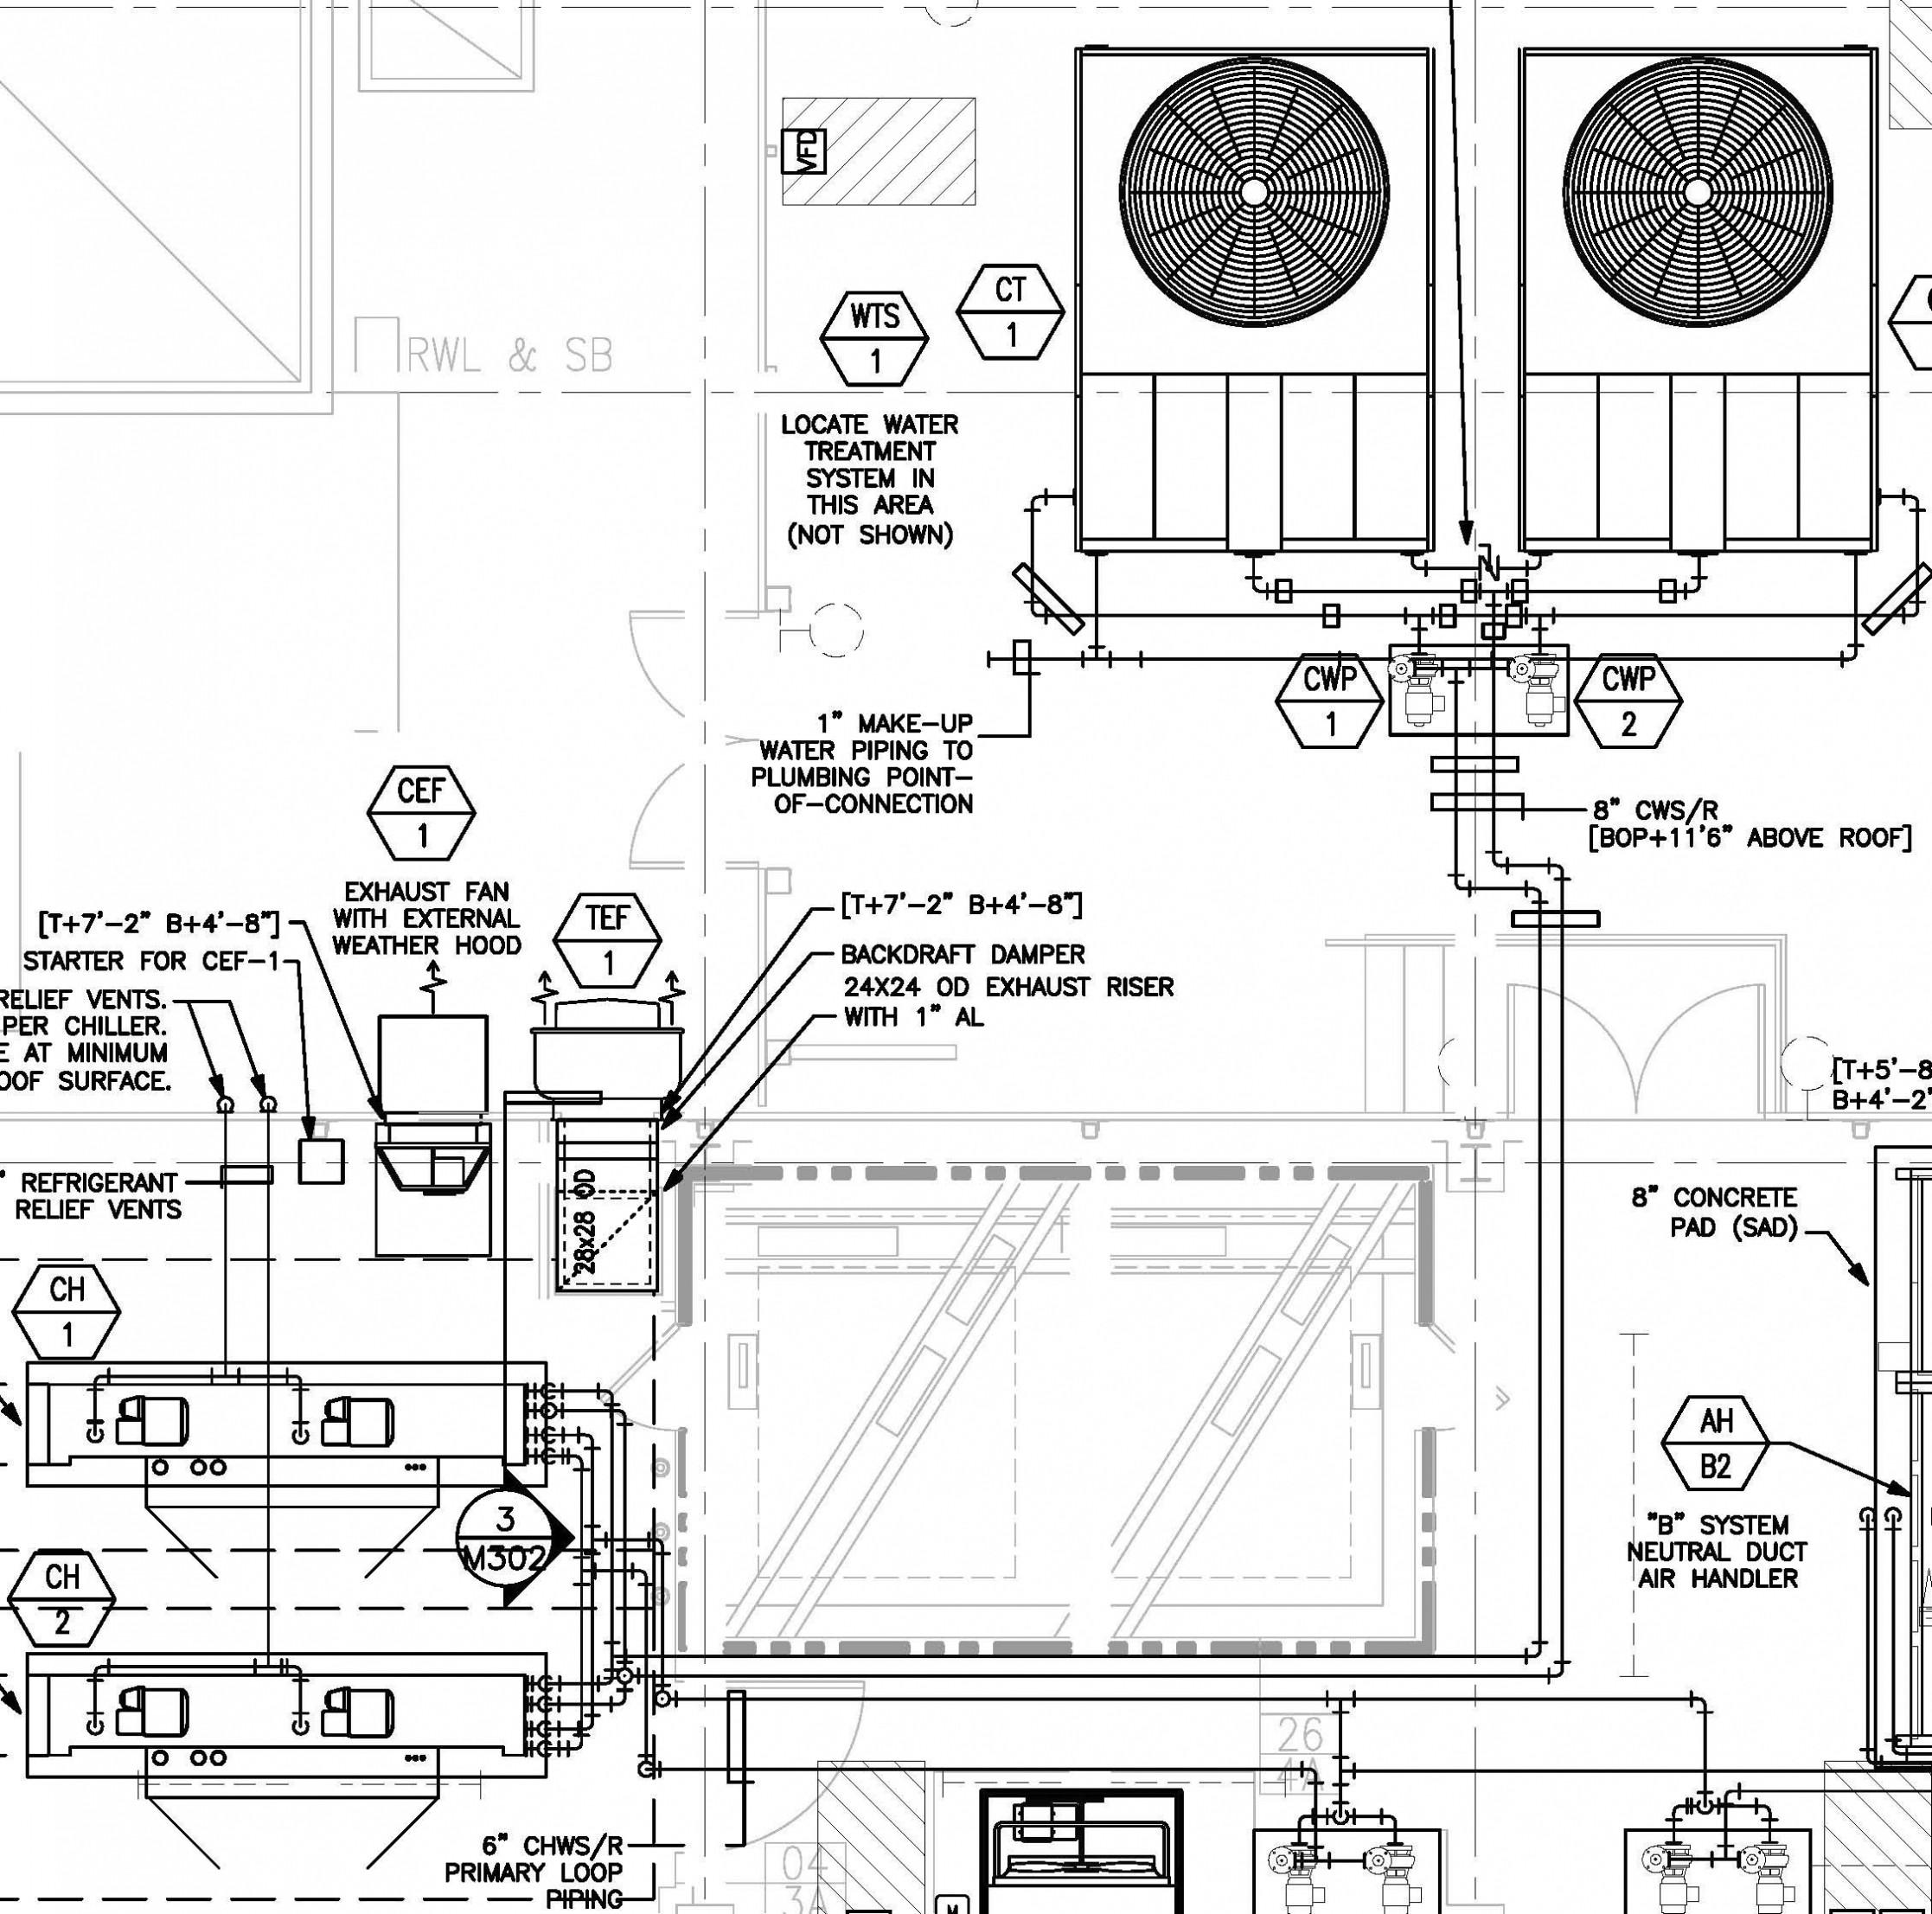 Car Engine Layout Diagram Car Ac Air Duct Diagram Wiring Schematics Diagram Of Car Engine Layout Diagram